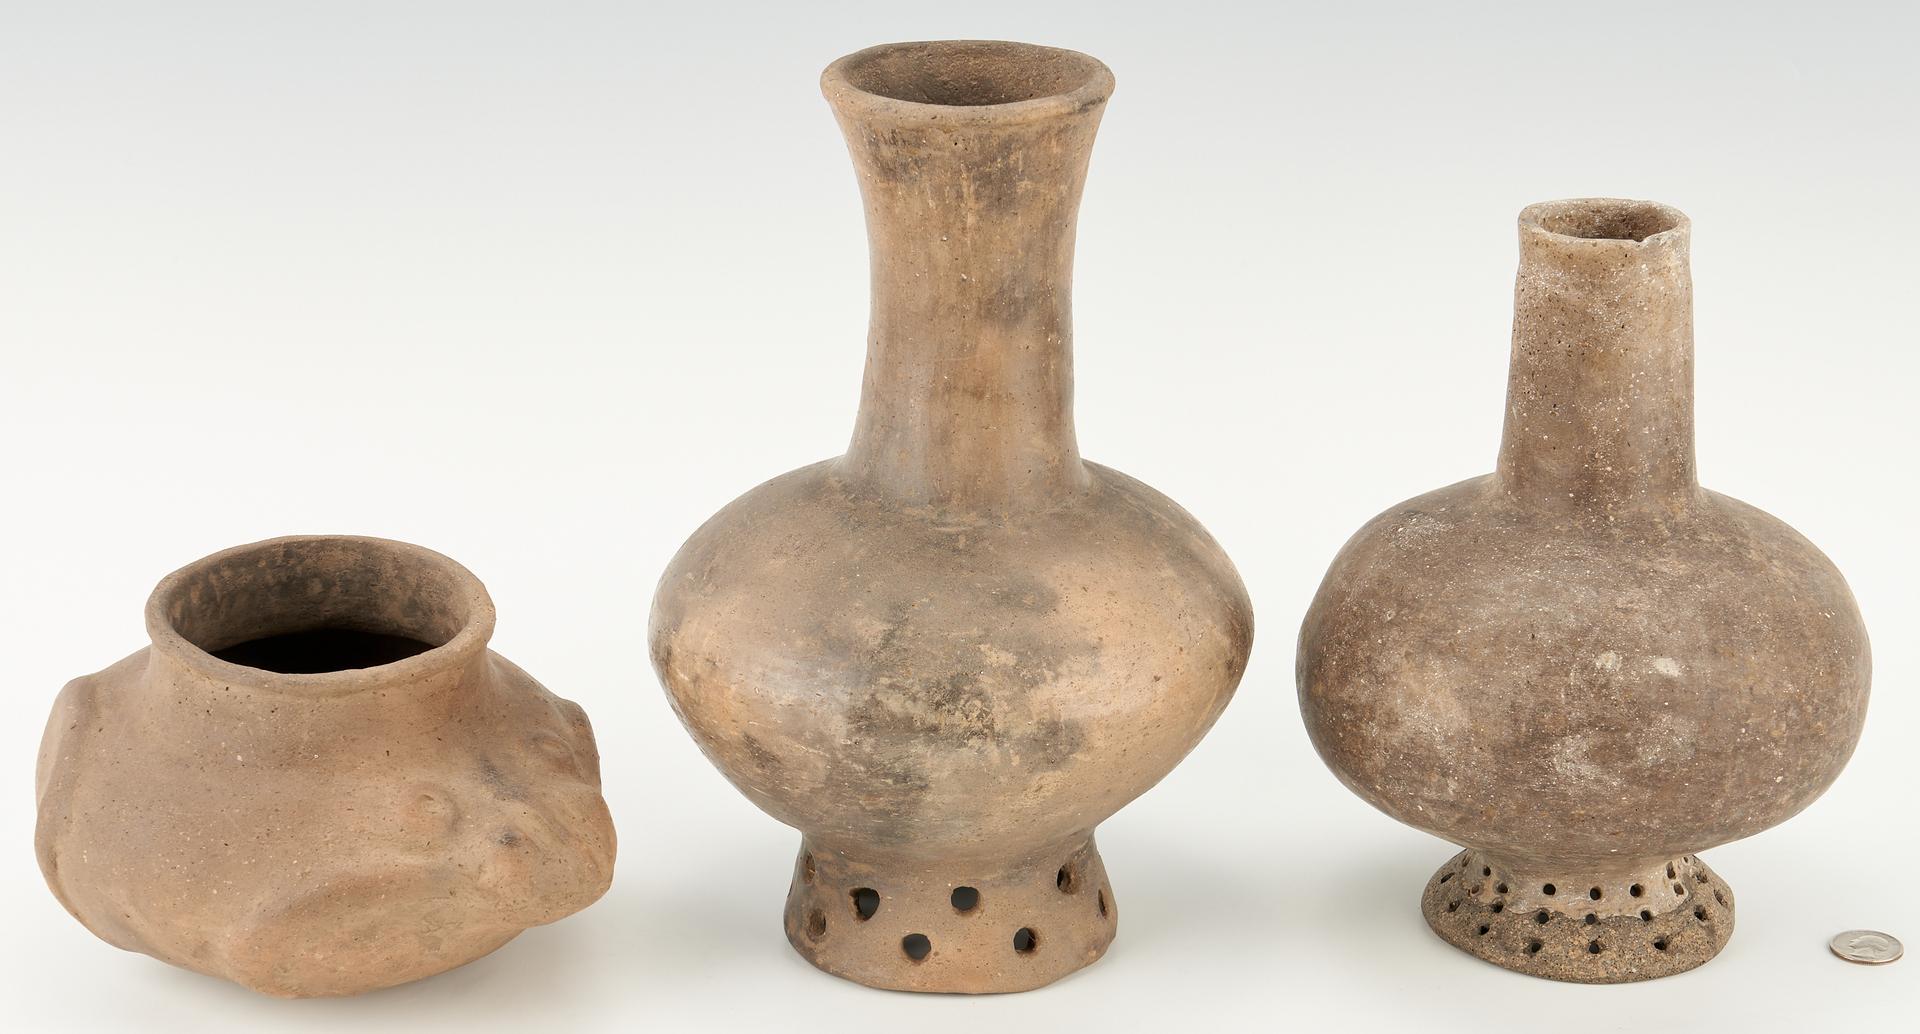 Lot 1108: 3 Mississippian Culture Pottery Pieces